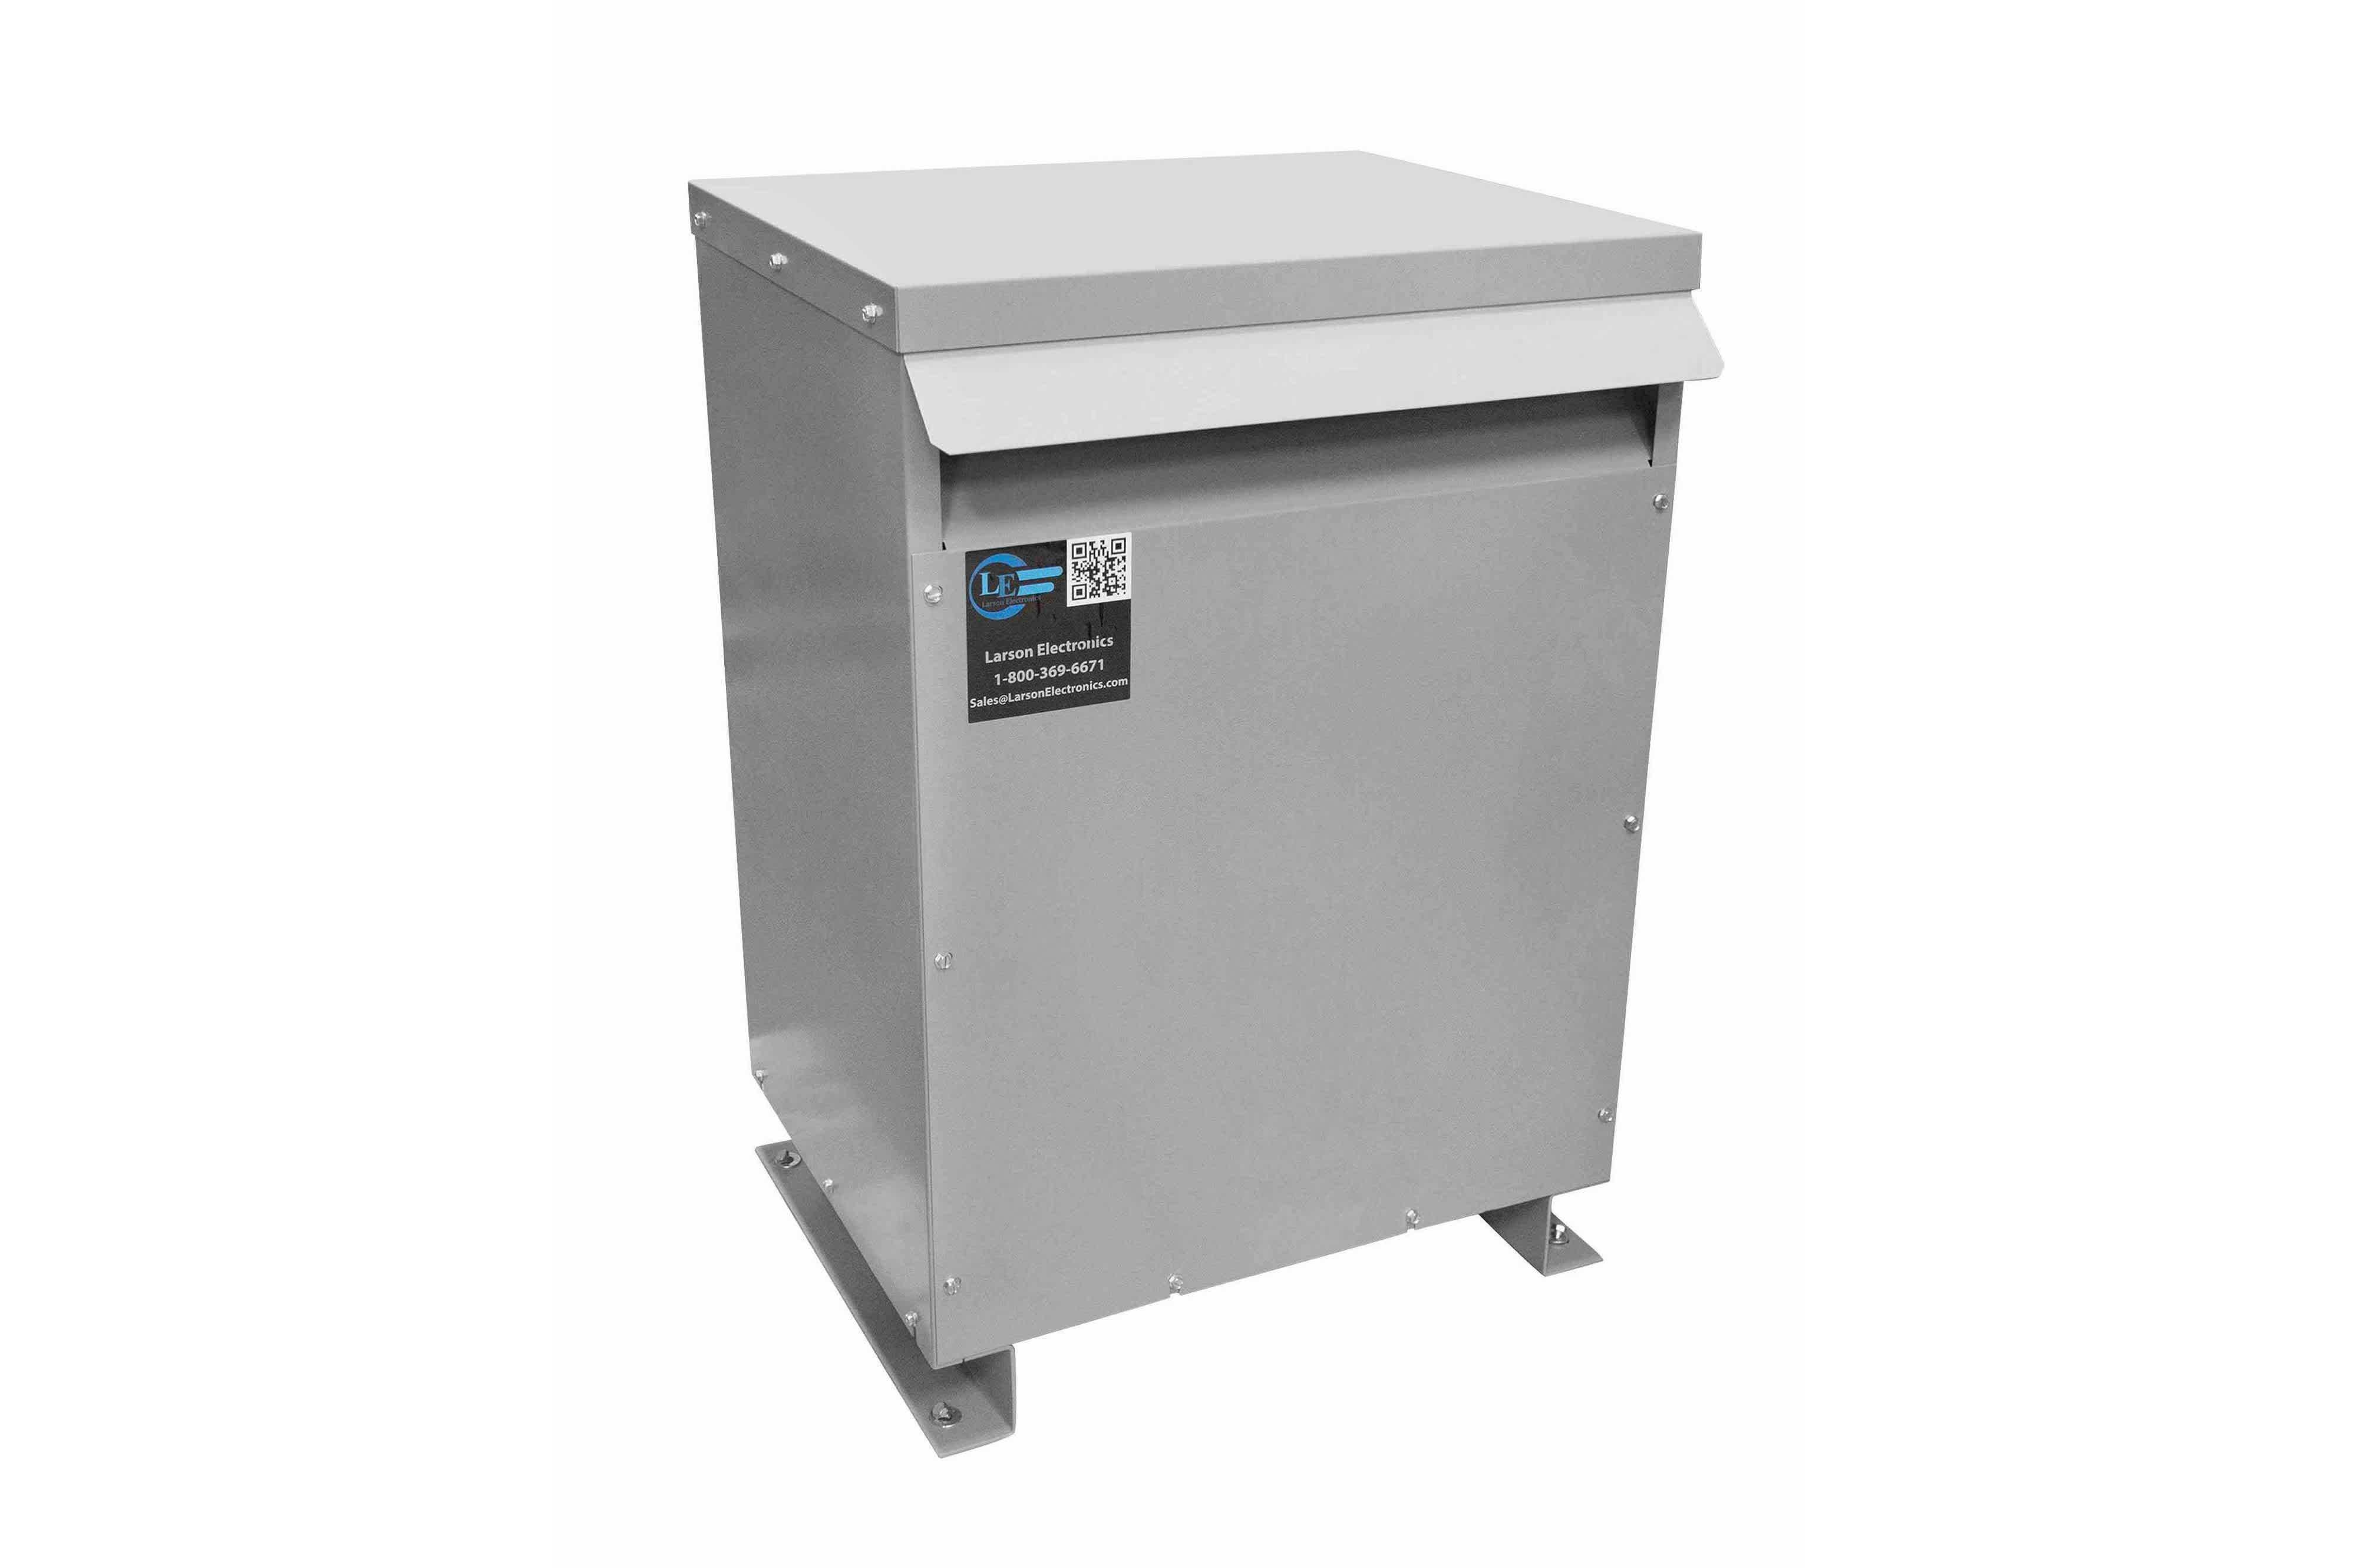 55 kVA 3PH Isolation Transformer, 600V Wye Primary, 208V Delta Secondary, N3R, Ventilated, 60 Hz